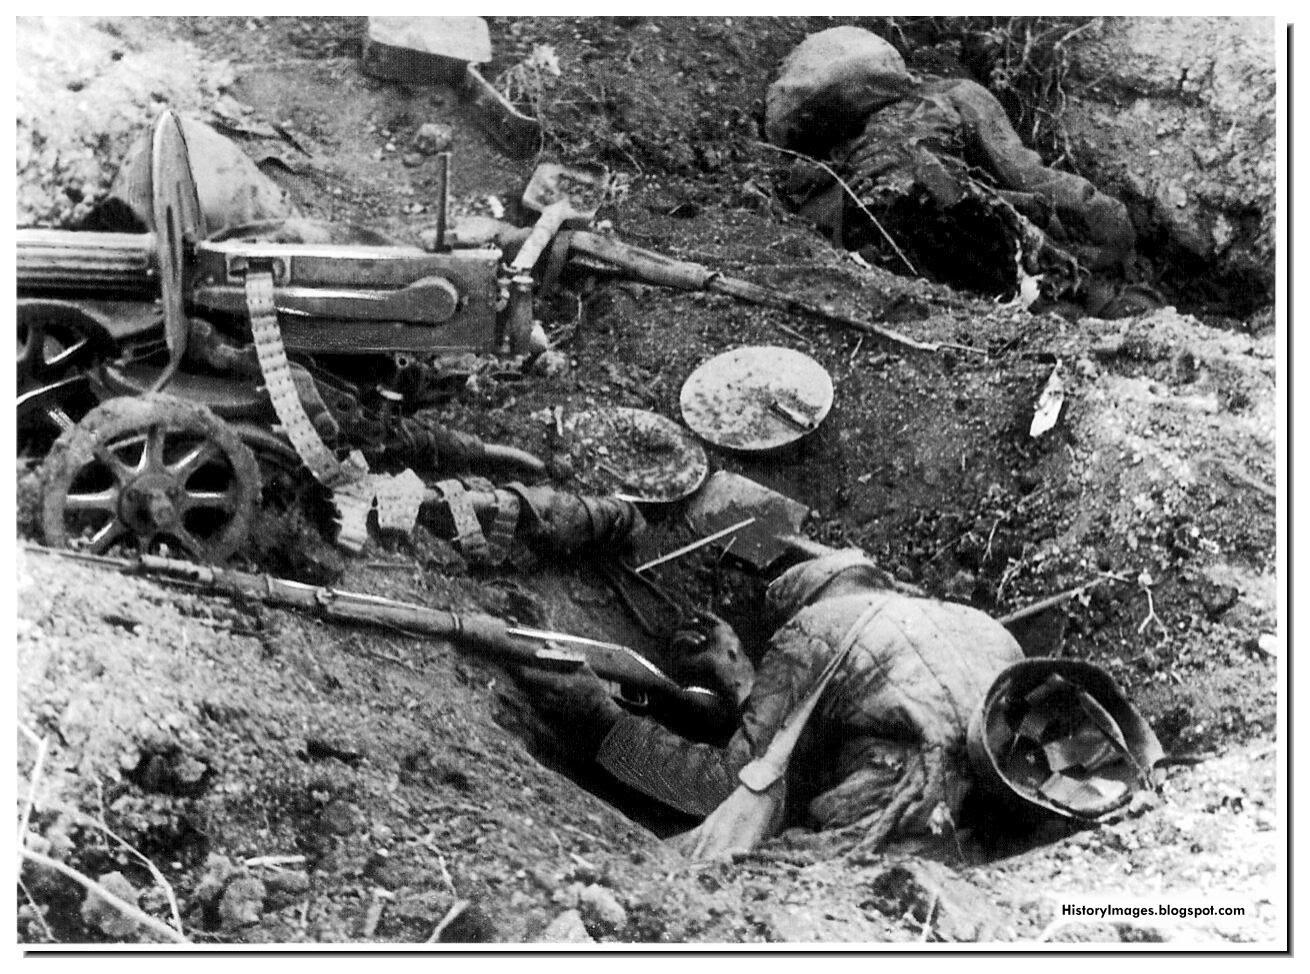 Soviet machine gun crew killed fighting